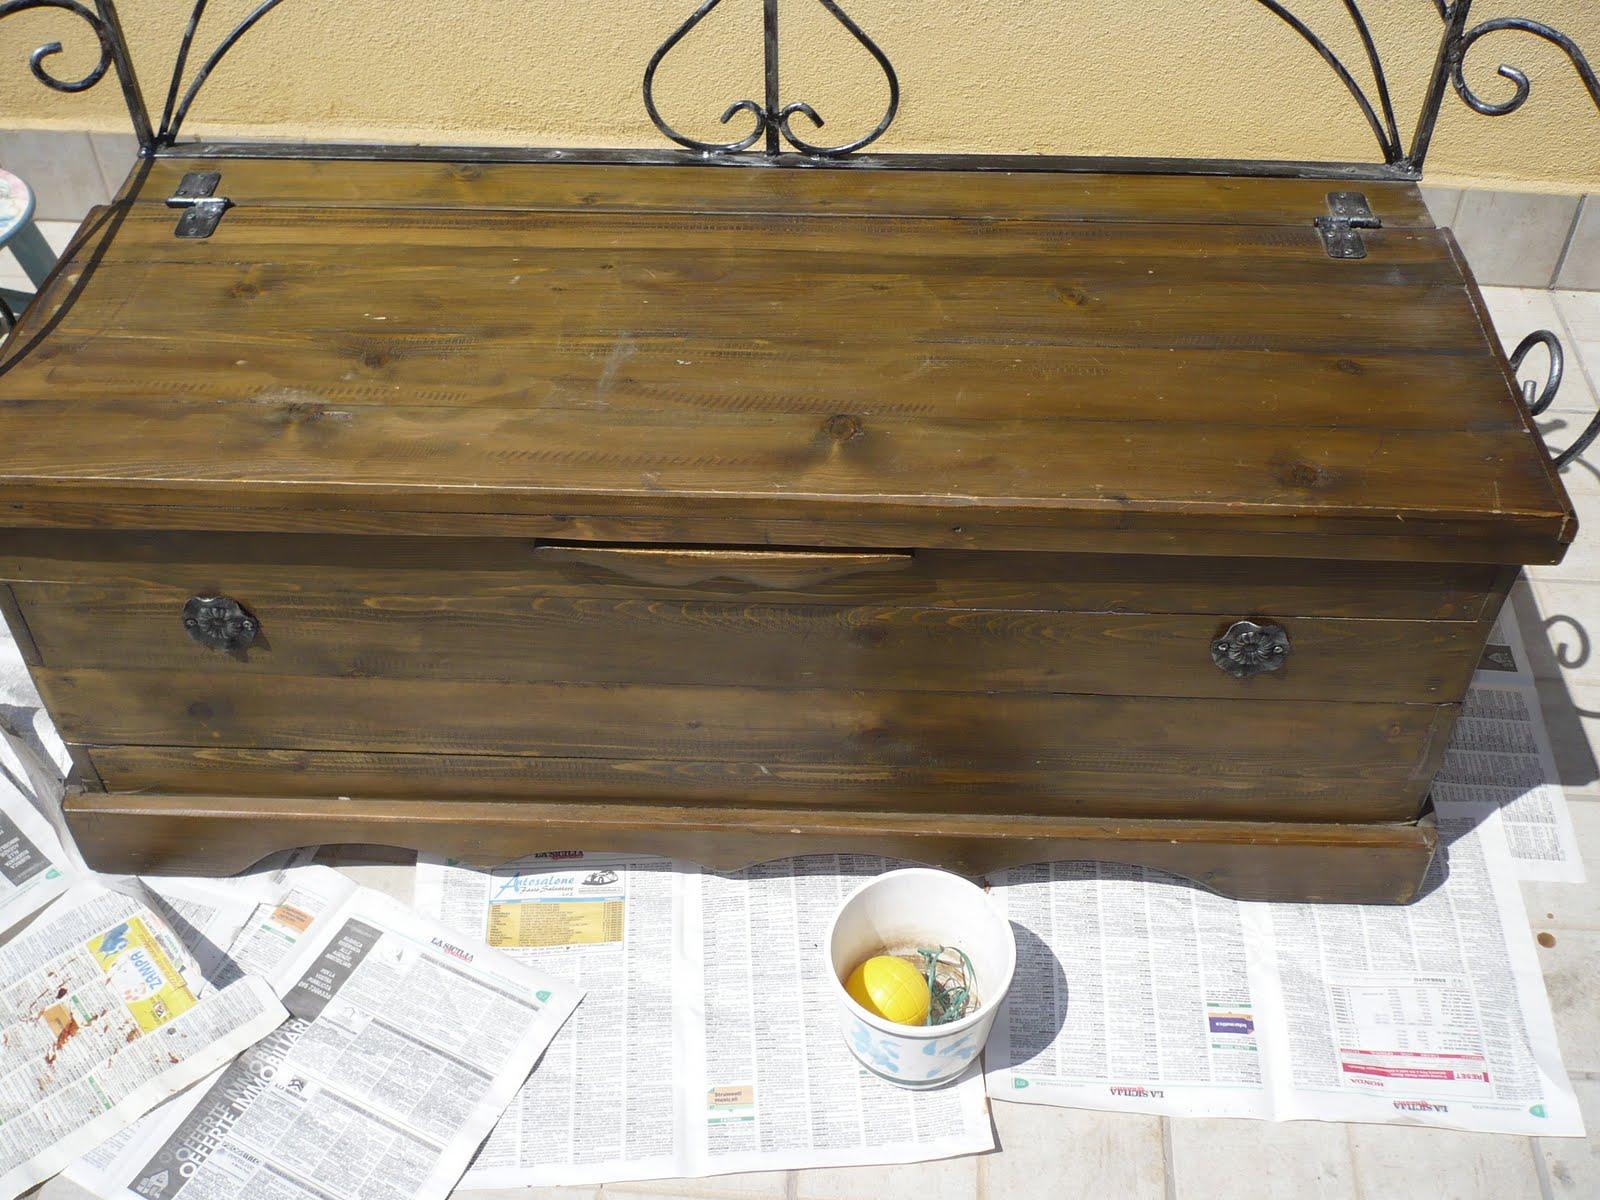 Italian cooking restaurare i vecchi mobili for Mobili vecchi da restaurare